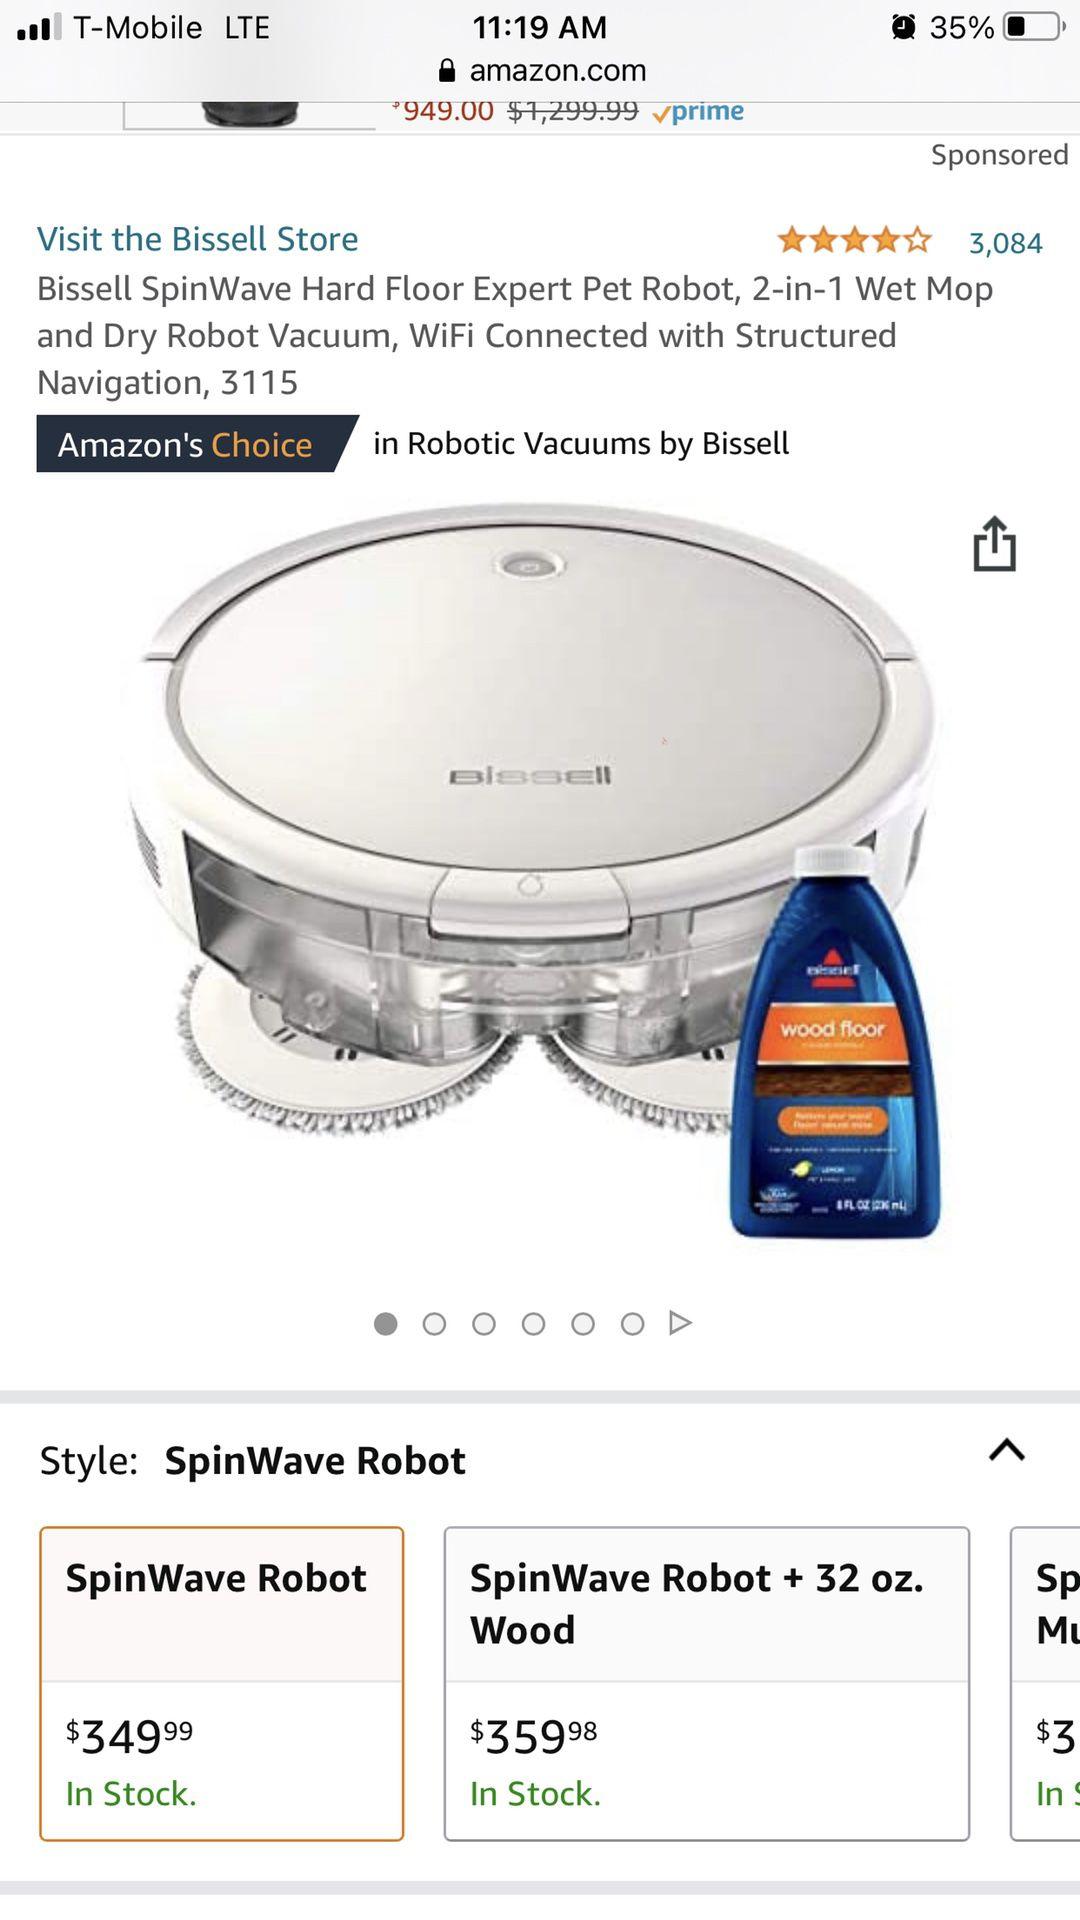 Bissell SpinWave Hard Floor Expert Pet Robot, 2-in-1 Wet Mop and Dry Robot Vacuum, WiFi Connected